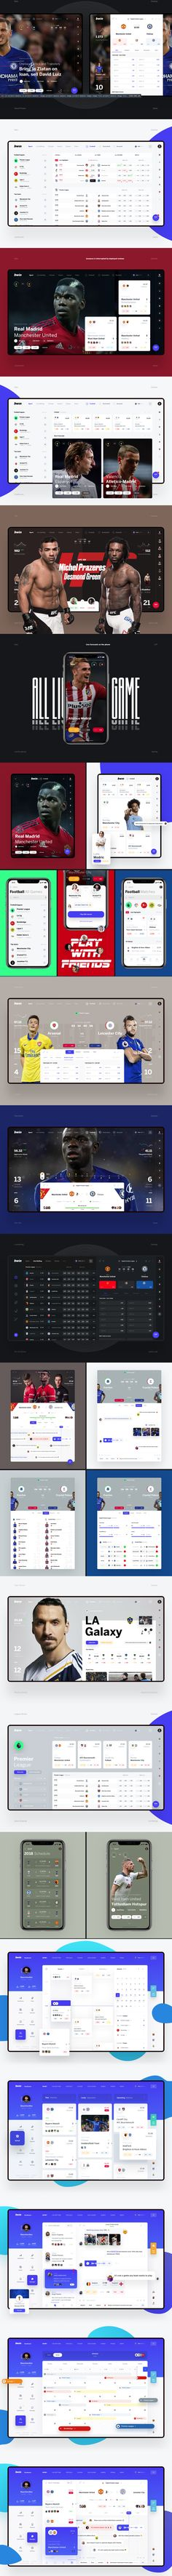 bwin Web Design, Layout Design, Adobe Xd, Dashboard Design, Ui Web, Website Designs, Dashboards, User Interface, Computers